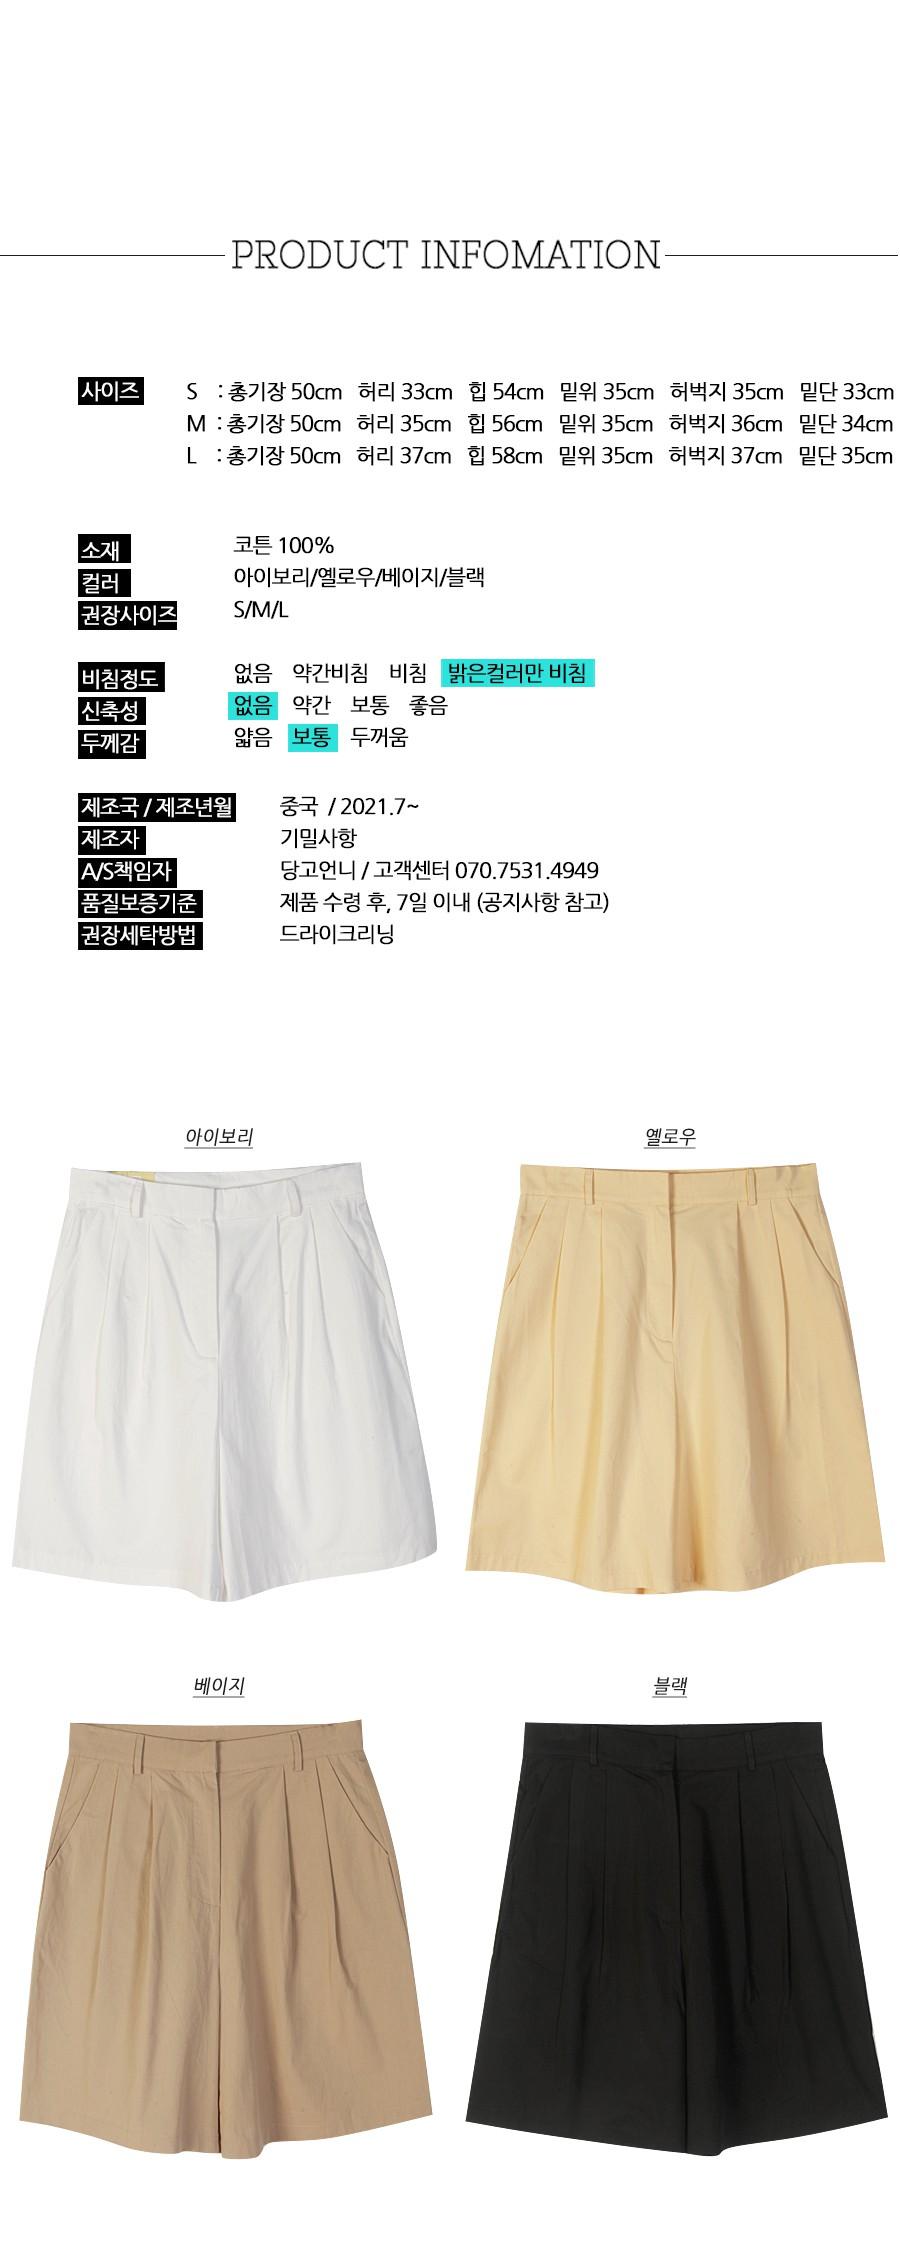 Dane Pintuck Cotton PT Comfortable 5 Secondary Length :D